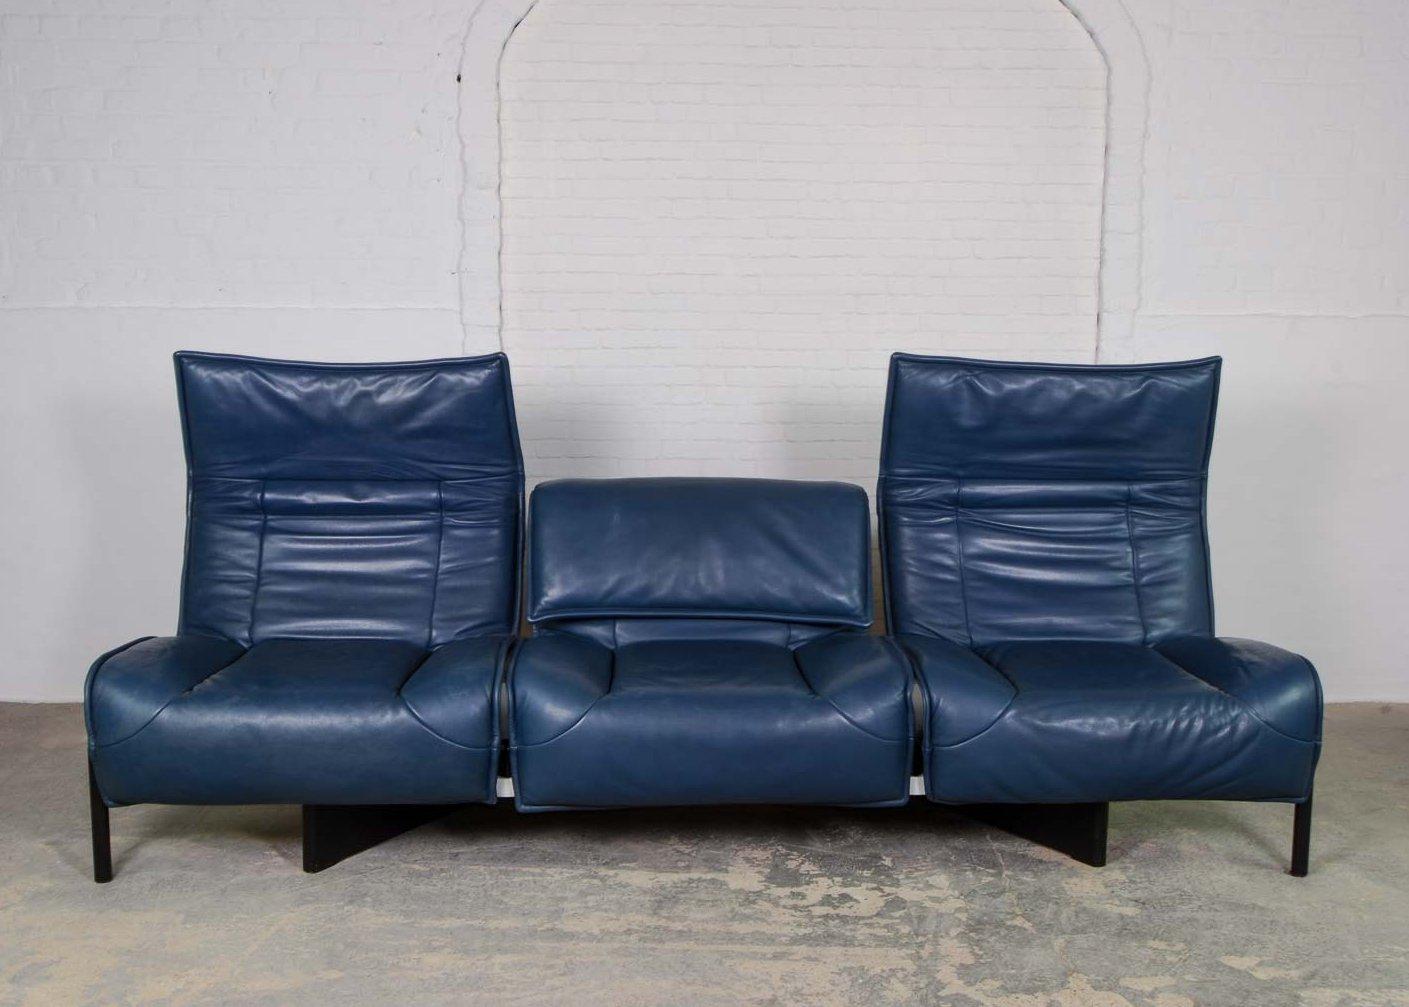 Mid Century Italian Design Adjustable Petrol Leather Veranda Sofa By Vico Magistretti For Cassina 65245